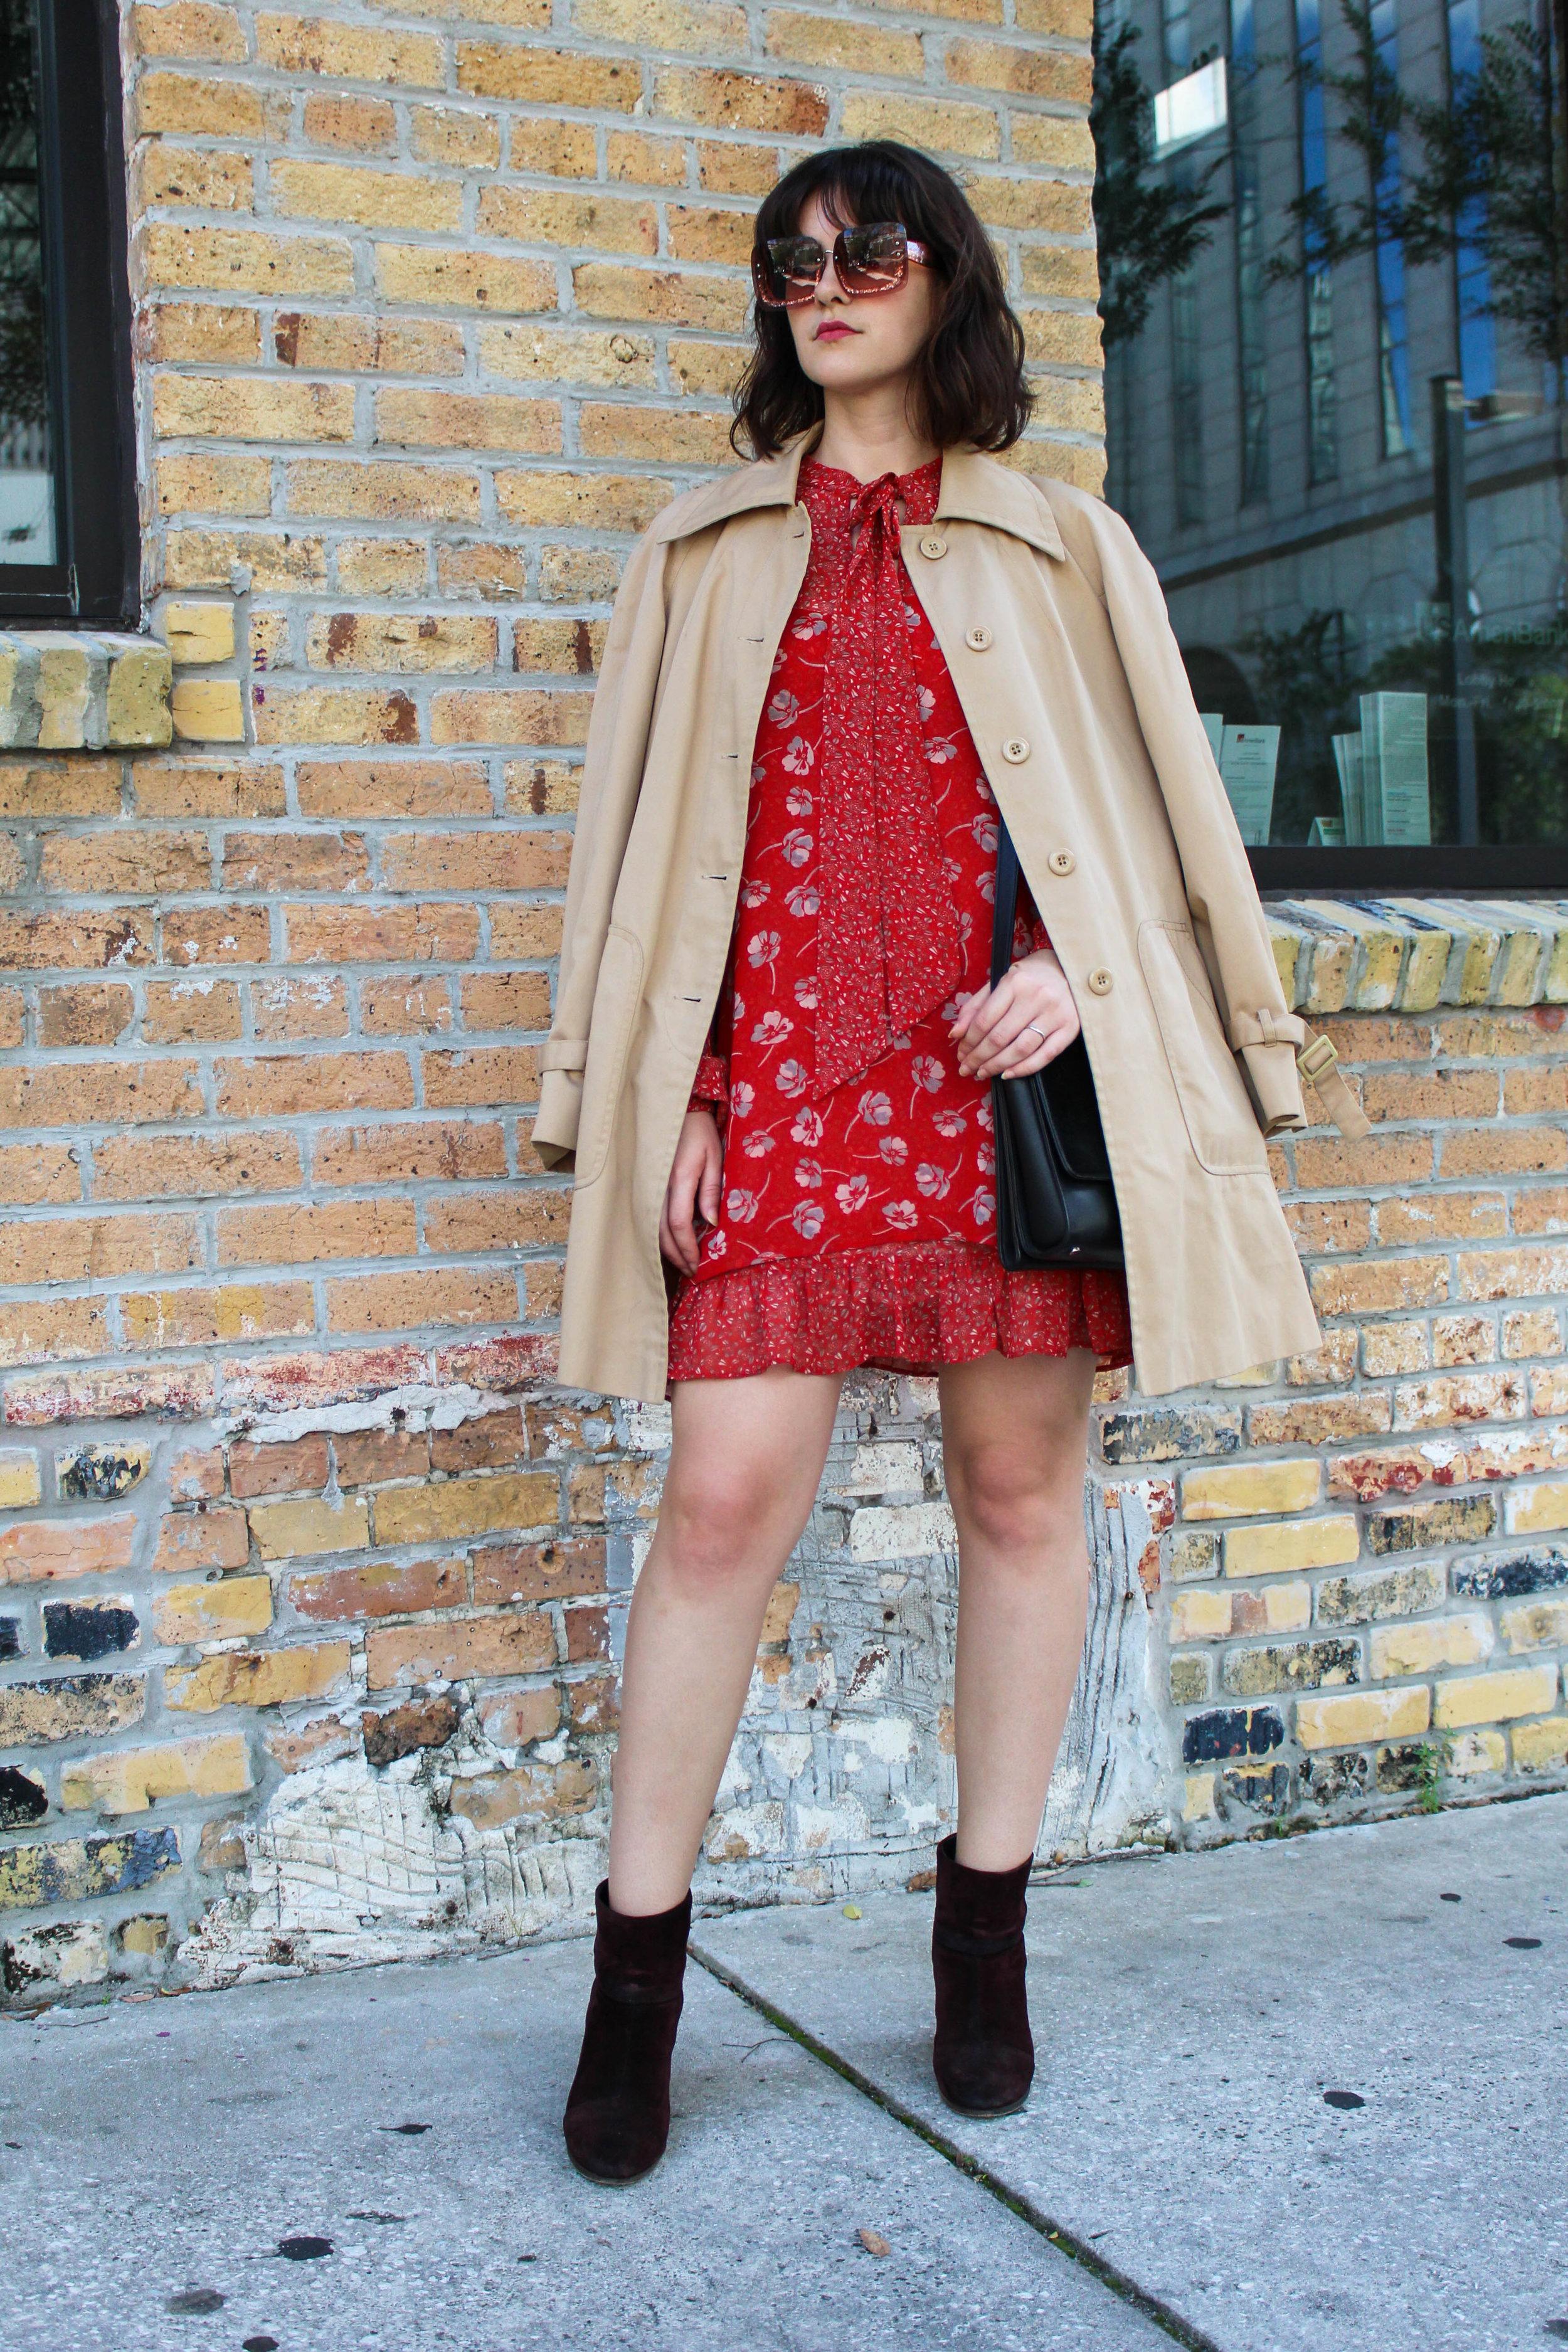 reddress-14.jpg